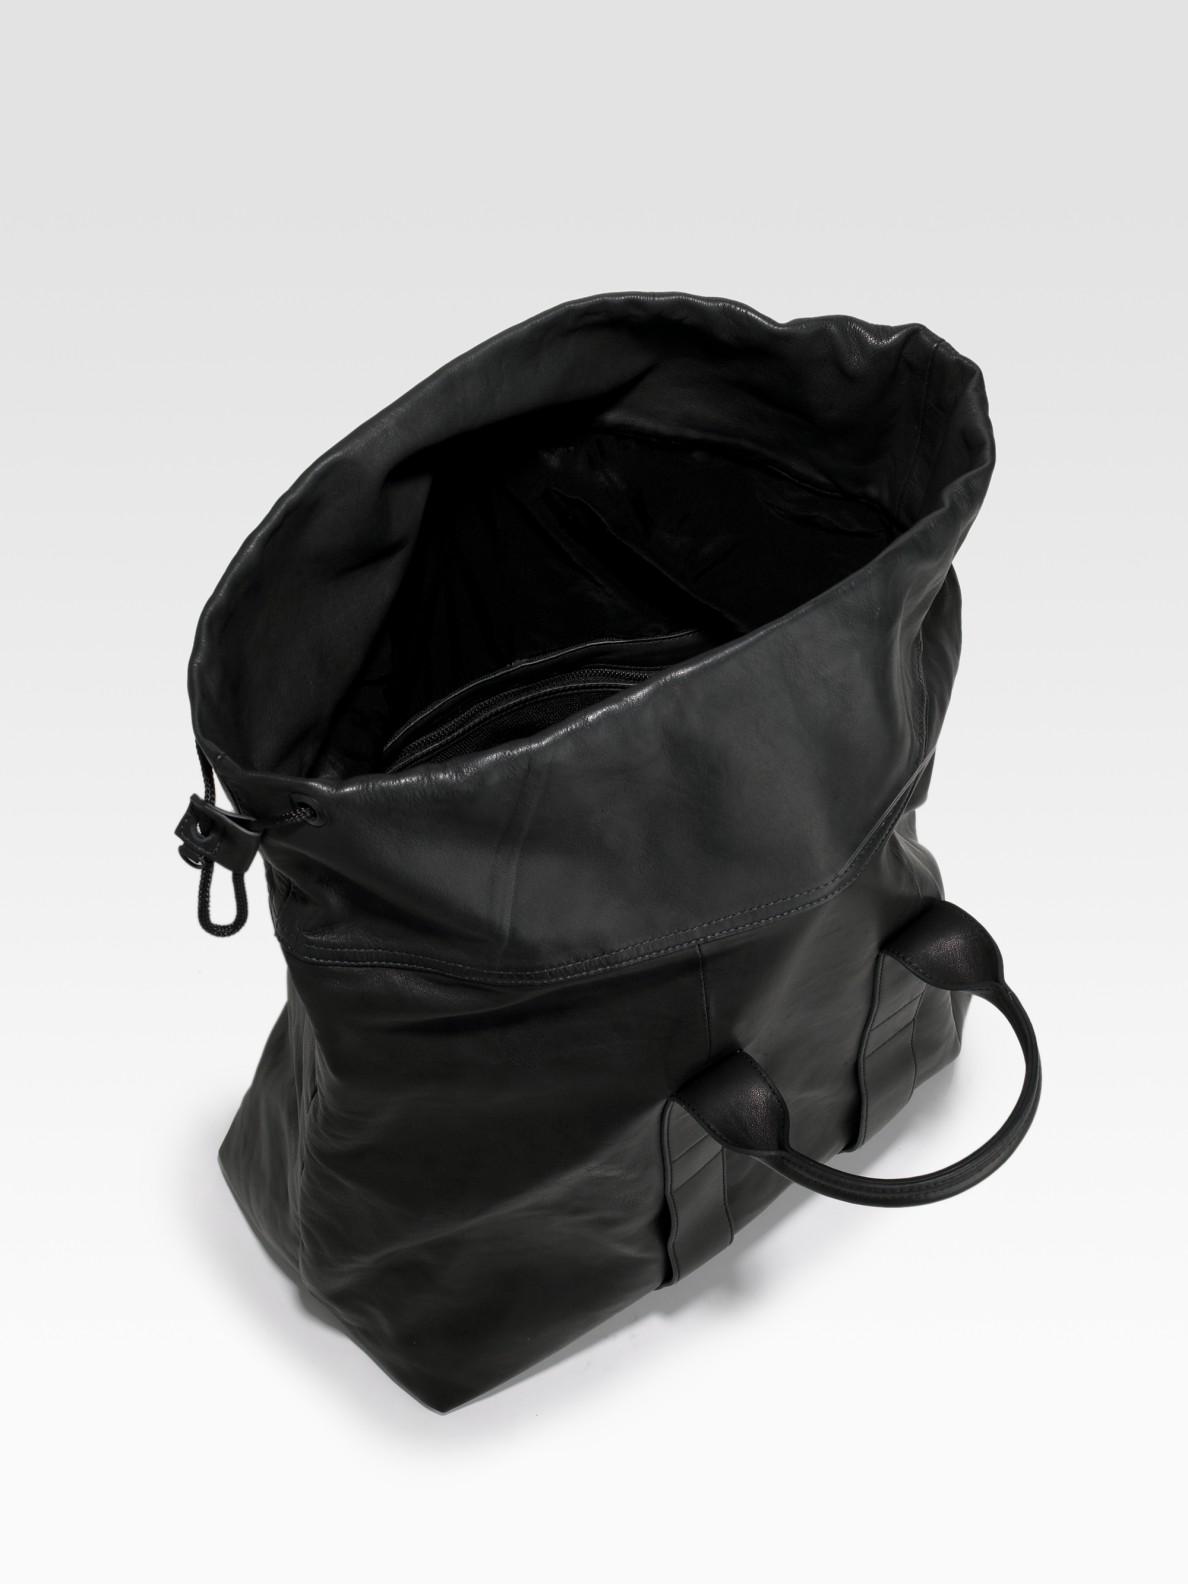 3.1 phillip lim 31 Hour Drawstring Bag in Black for Men | Lyst